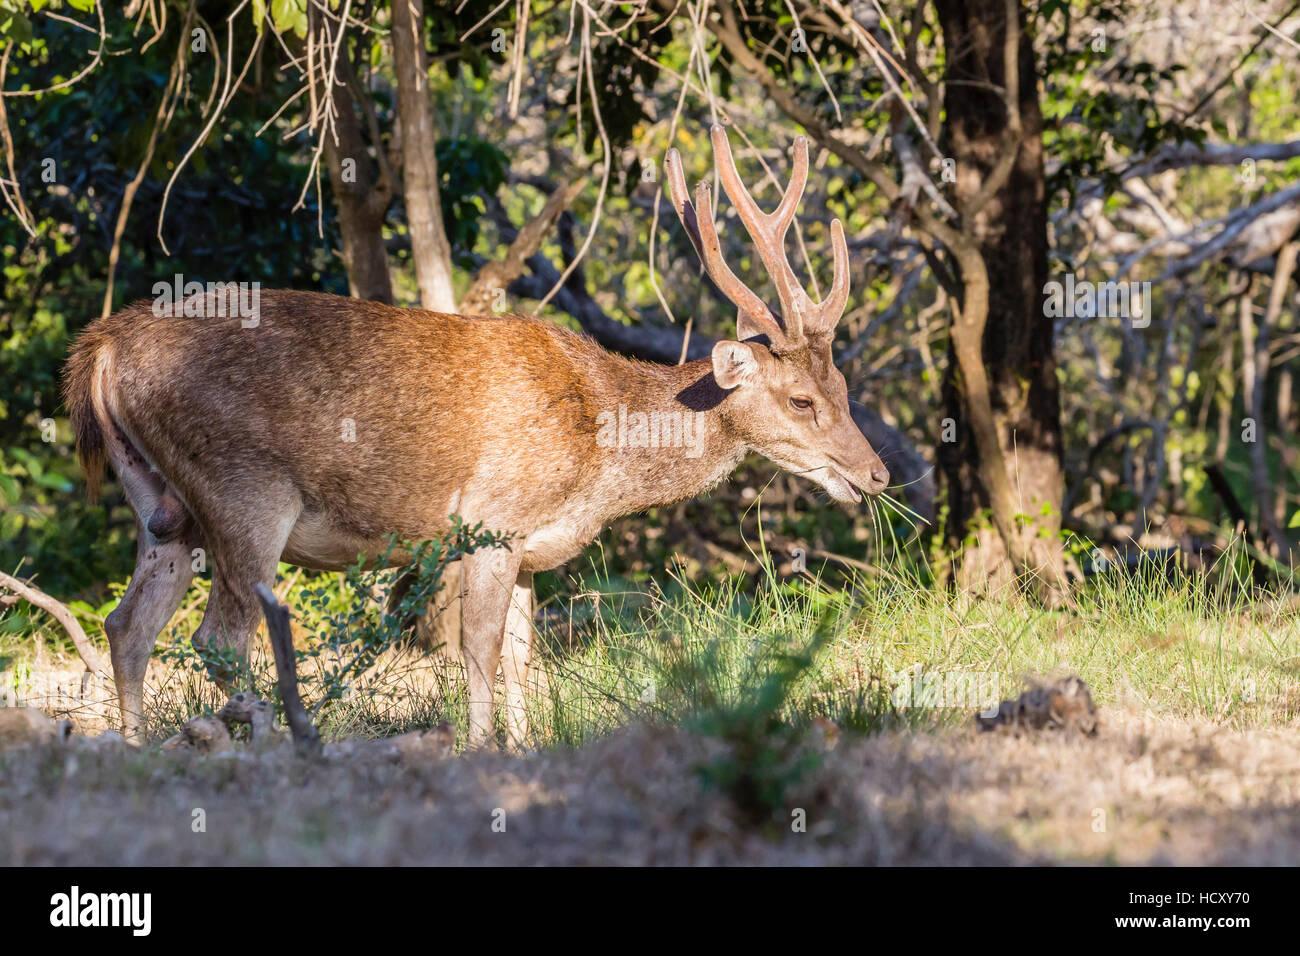 Adult buck Timor rusa deer (Cervus timorensis) in velvet on Rinca Island, Indonesia - Stock Image